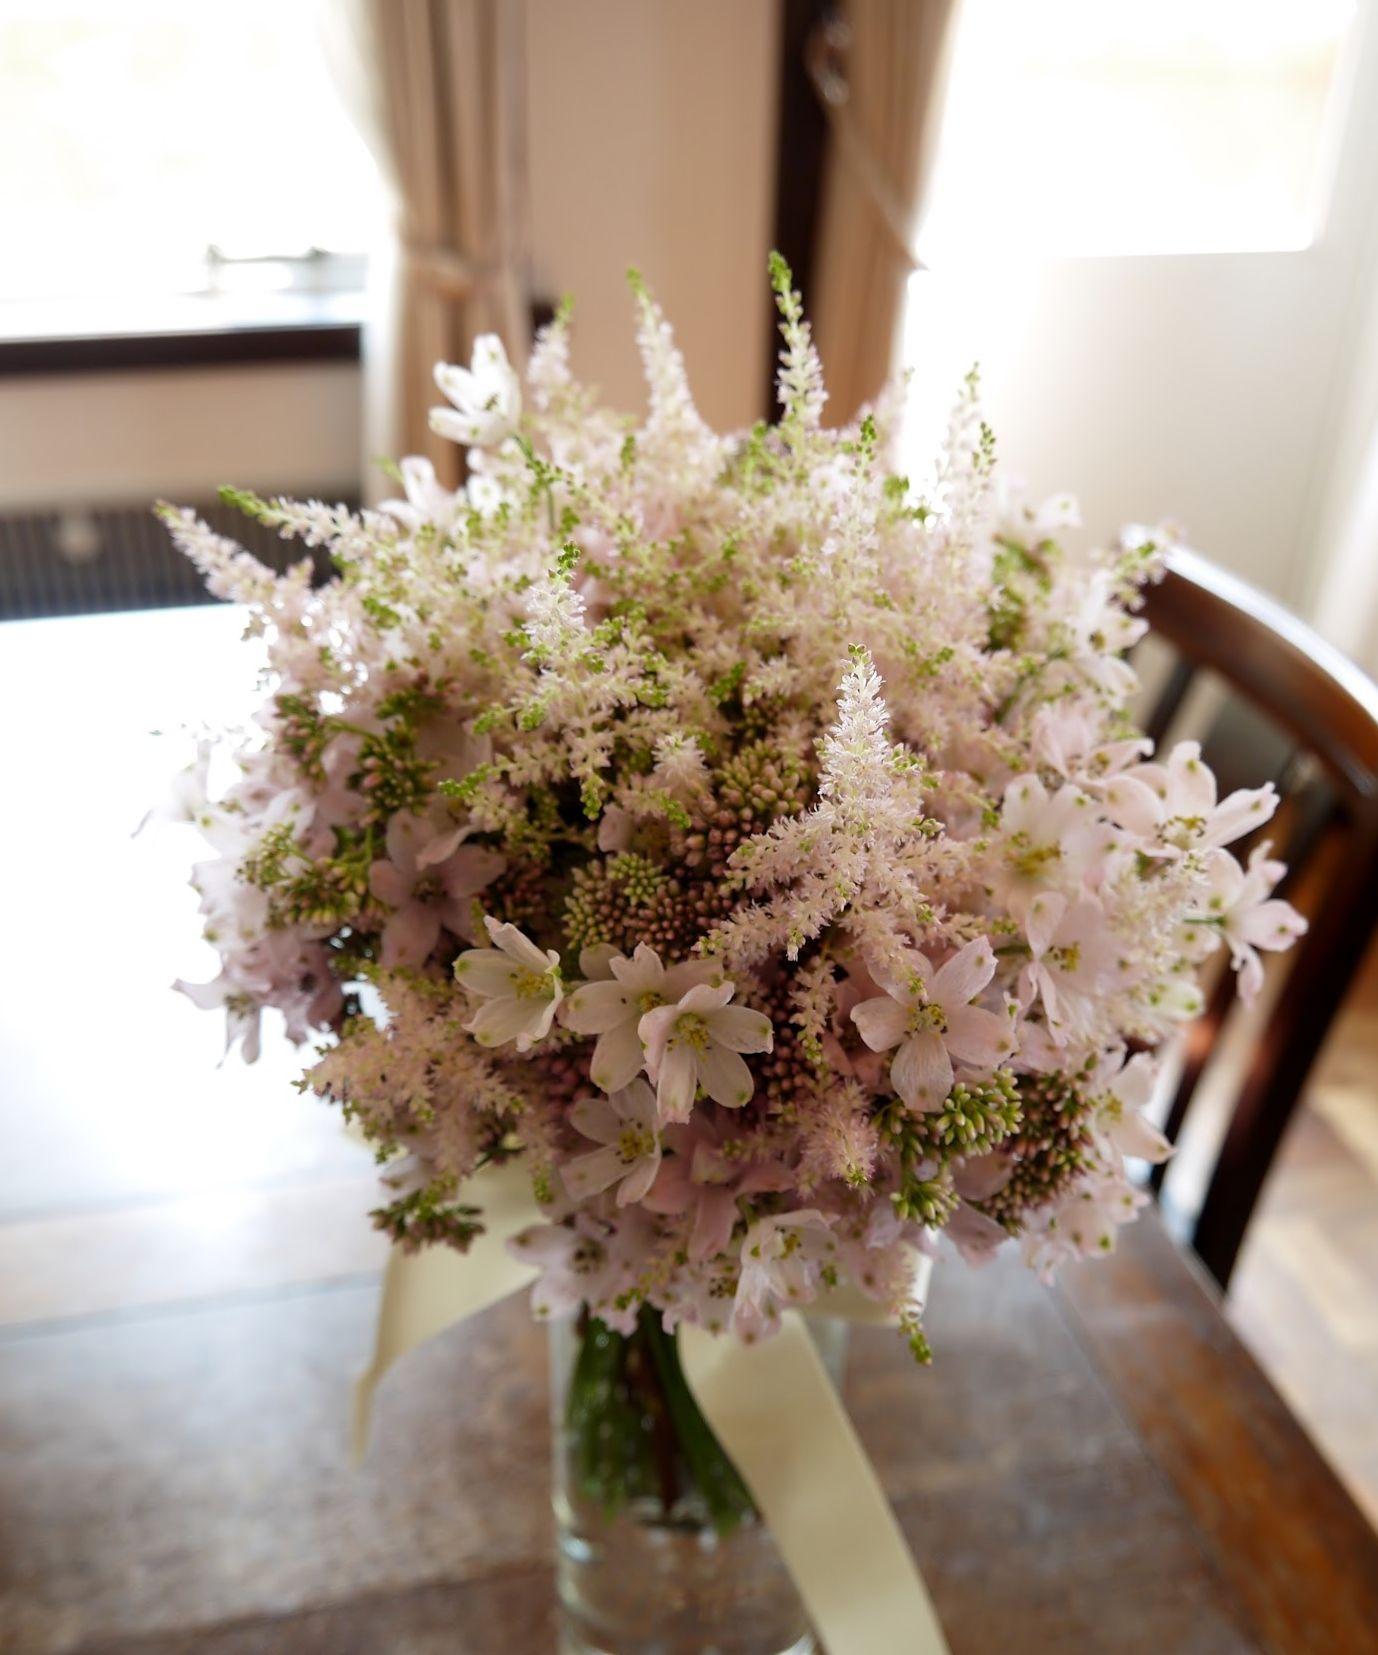 # Vress et Rose # Wedding # pink #smoky pink # Round # bouquet #clutch bouquet # natural # Flower # Bridal # ブレスエットロゼ #ウエディング# ピンク #スモーキーピンク  #シンプル # ブーケ #クラッチブーケ # ナチュラル# 花 #ダリア# ブライダル#結婚式